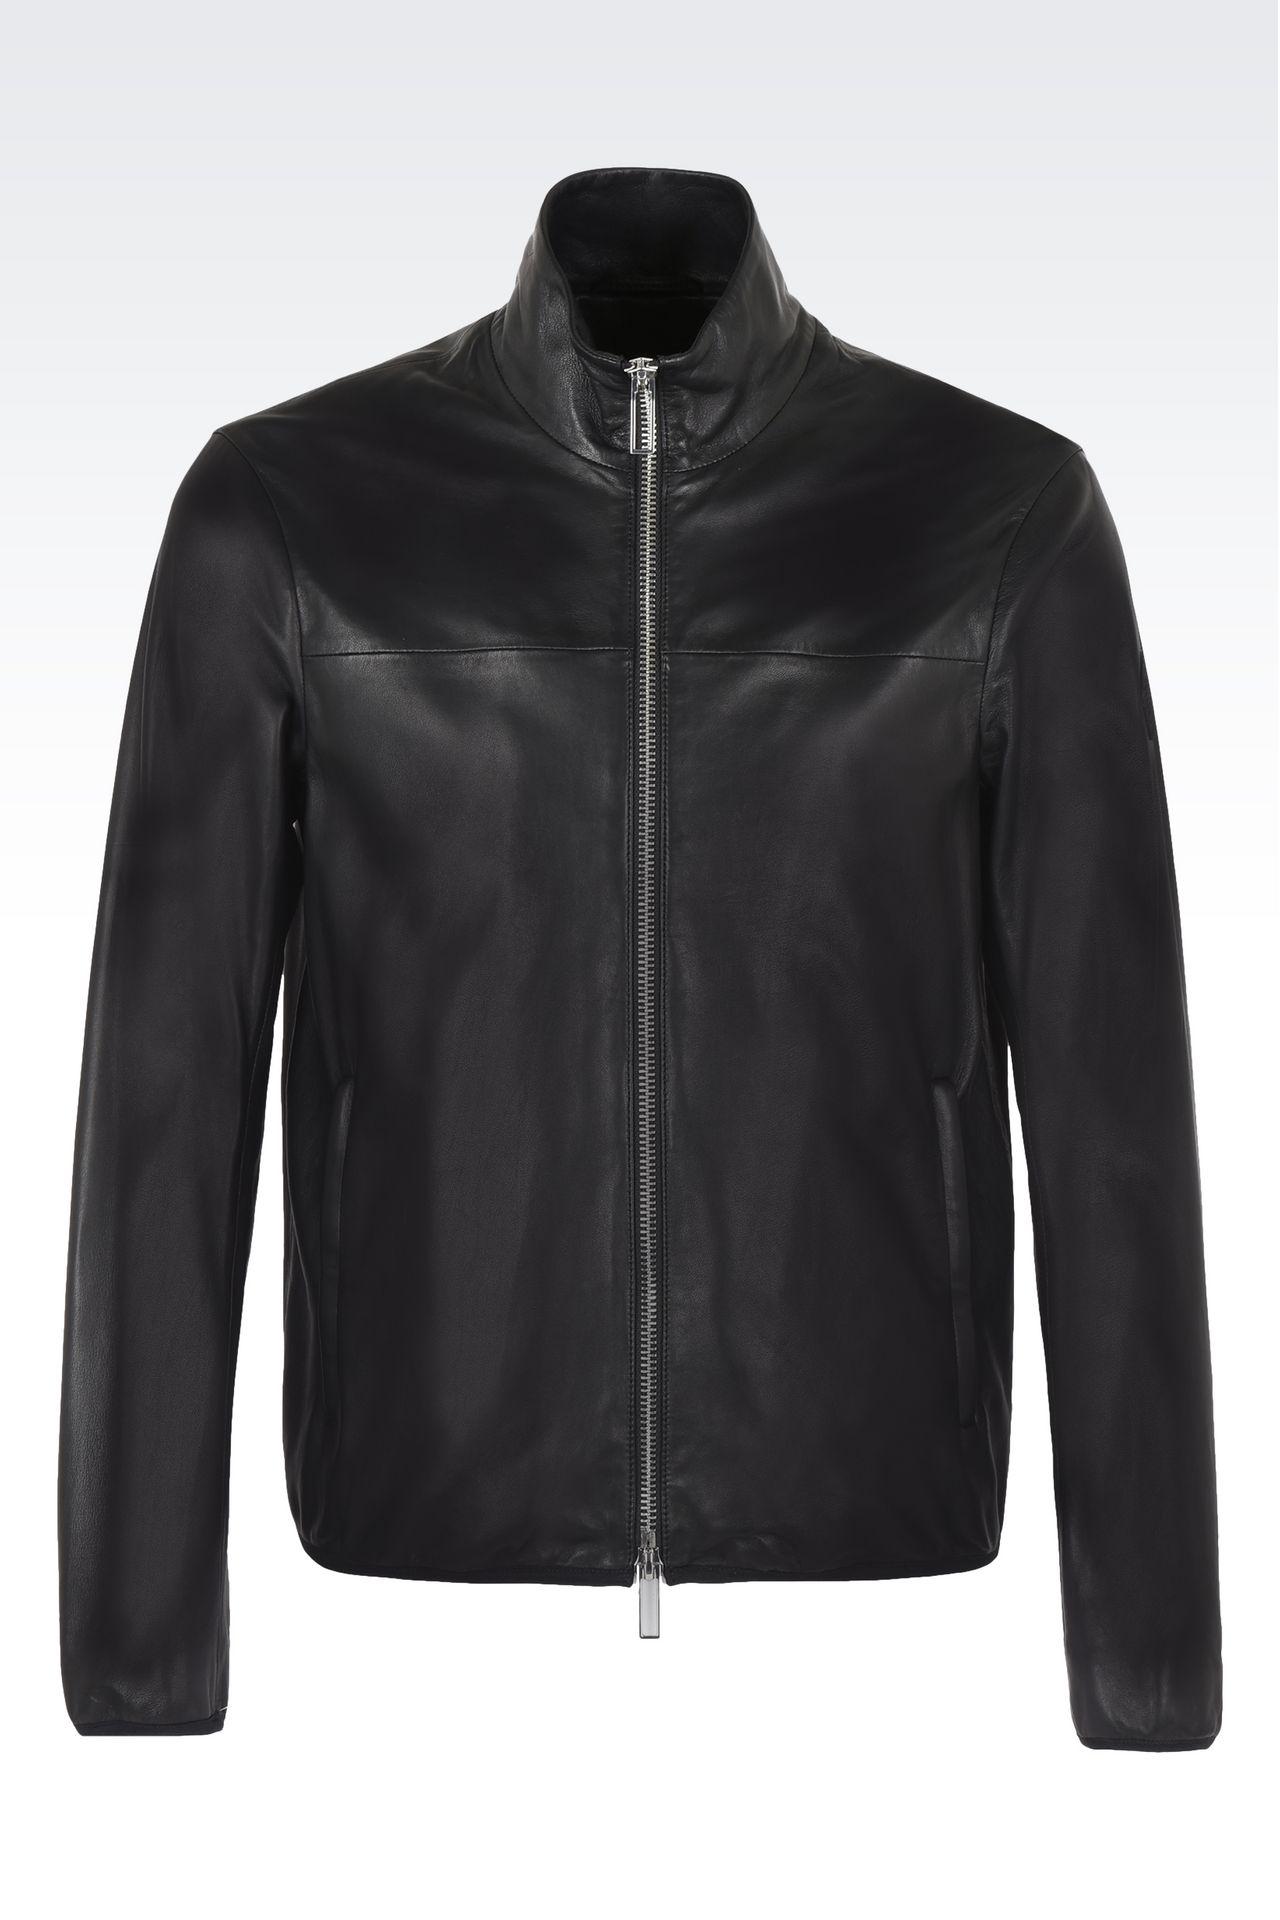 armani jackets armani blouson jackets men outerwear DXCSBDY